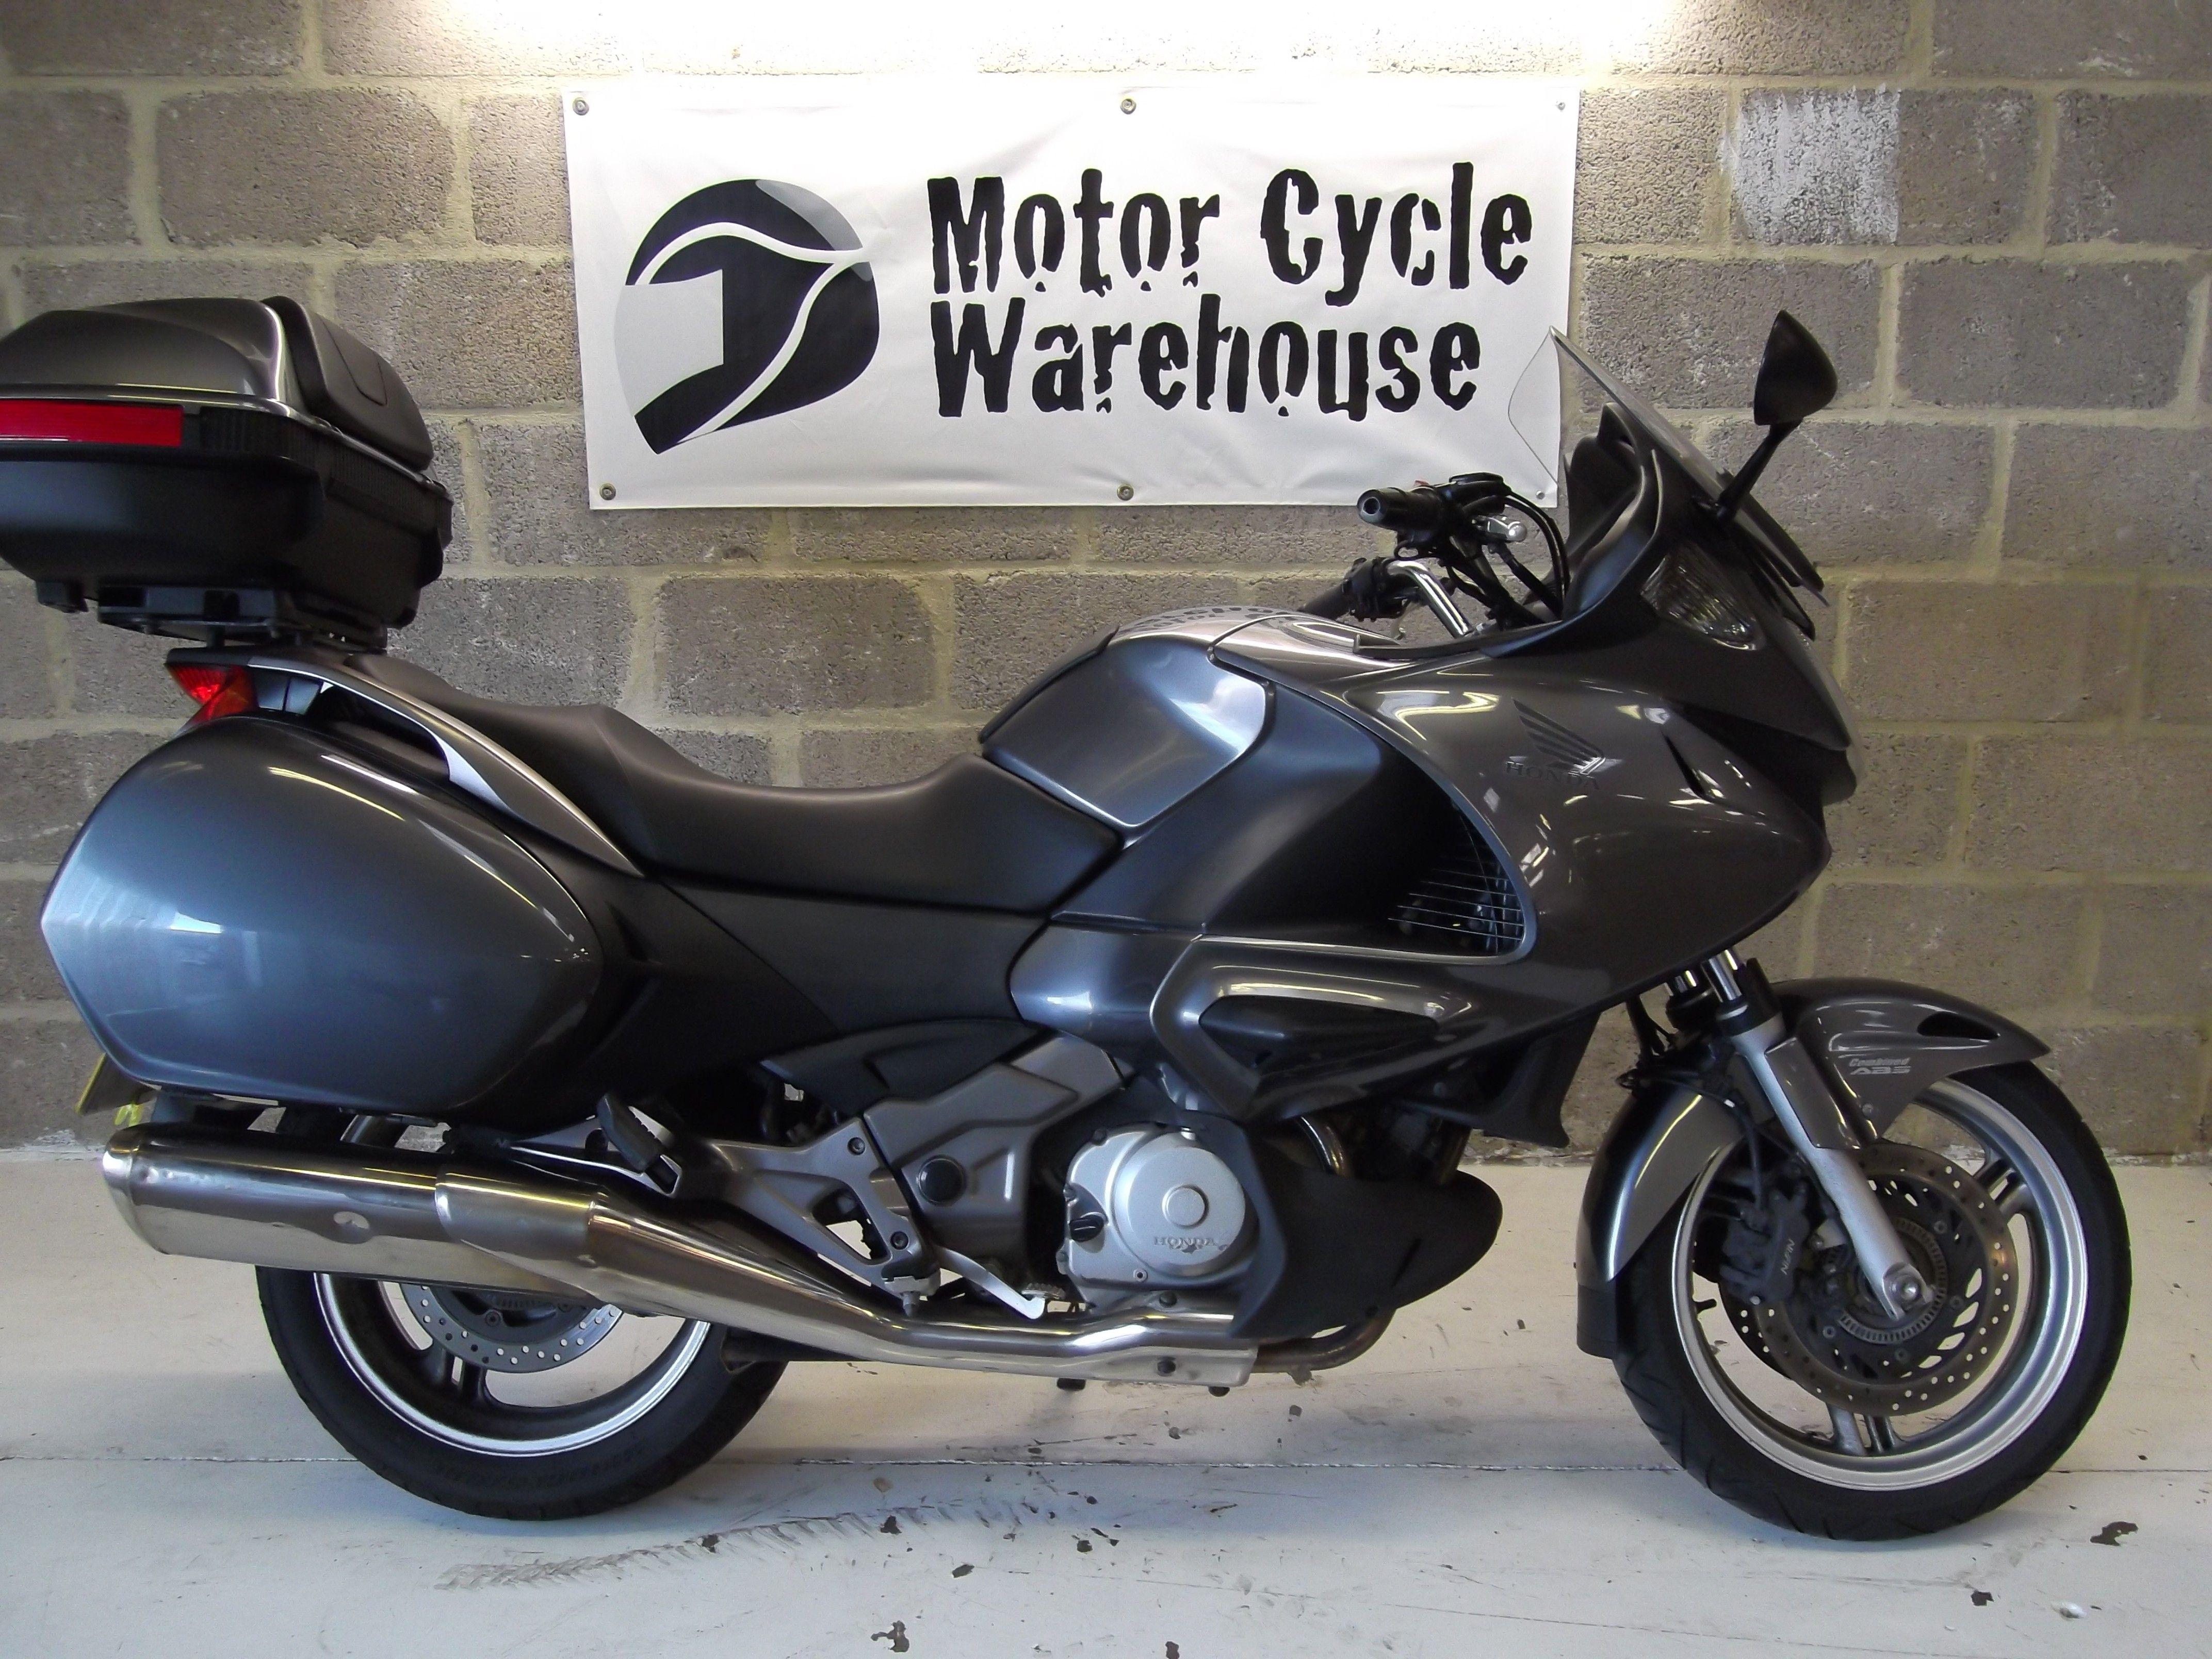 Used Honda Motorcycles >> Honda Nt 700 Deauville Honda Used Motorcycles